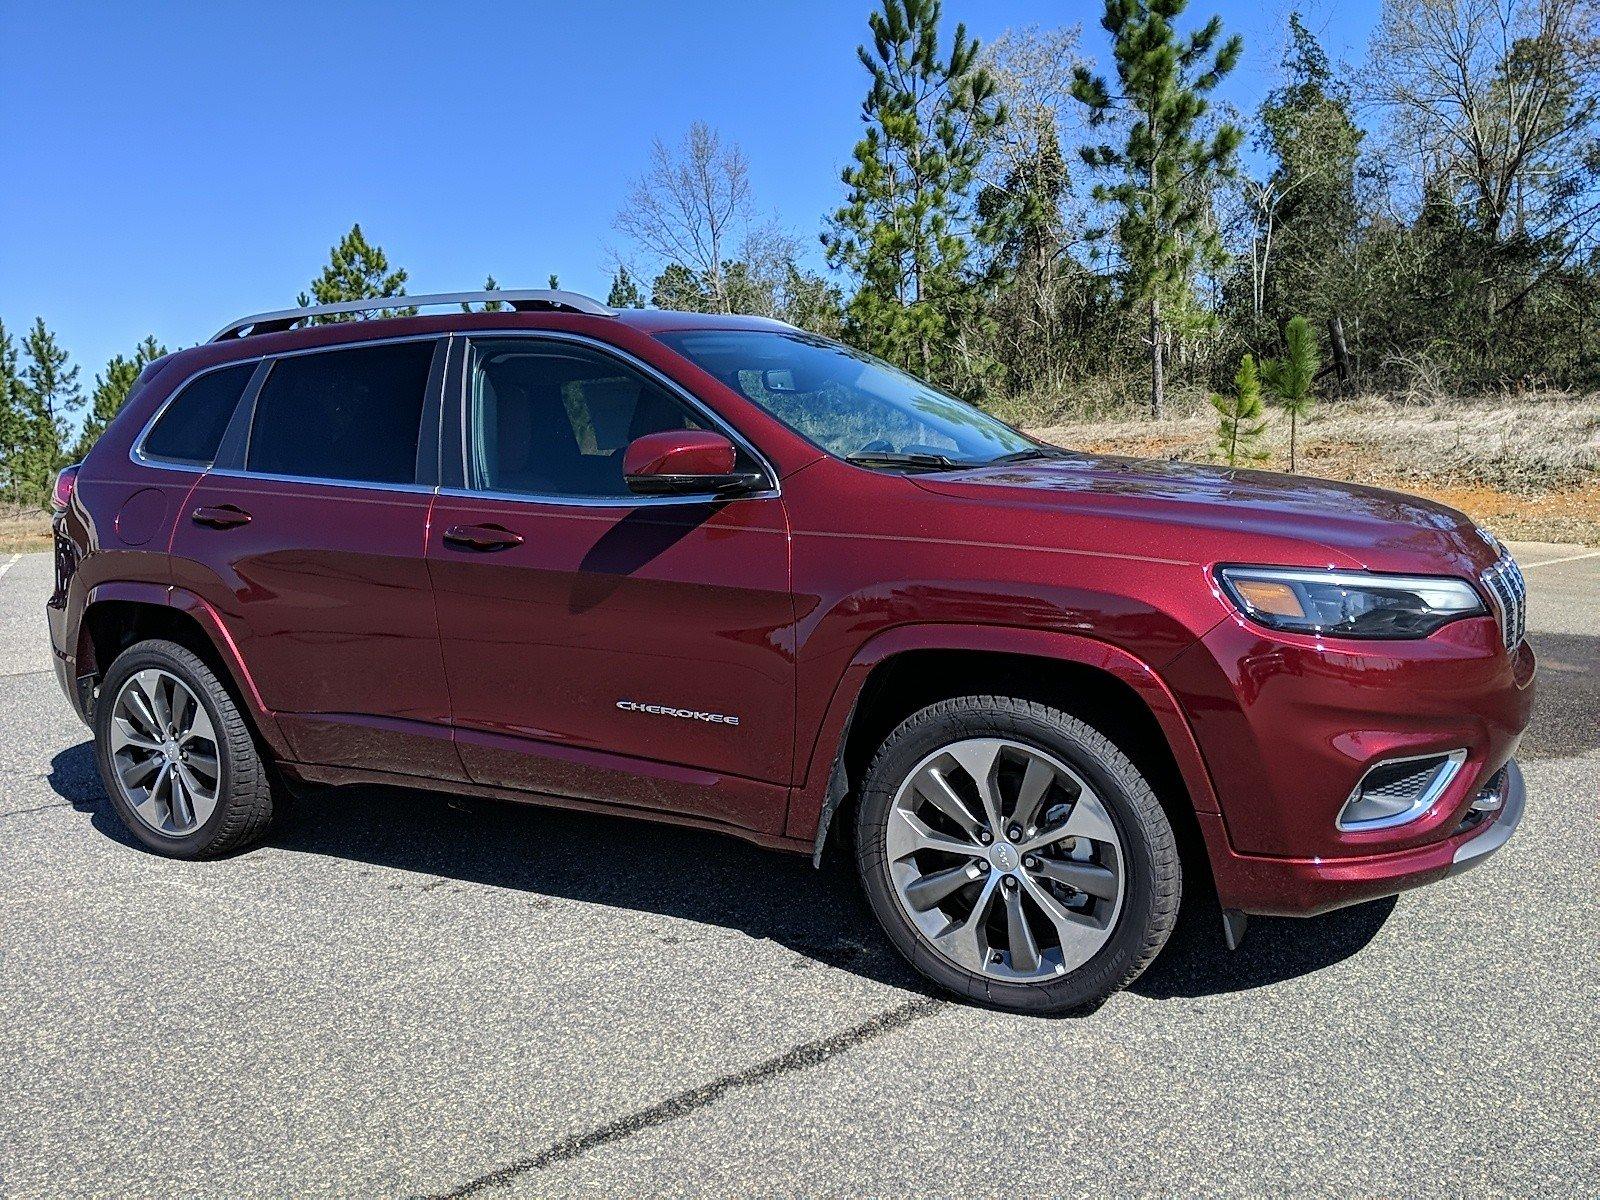 2019 Jeep Cherokee OVERLAND FWD Sport Utility